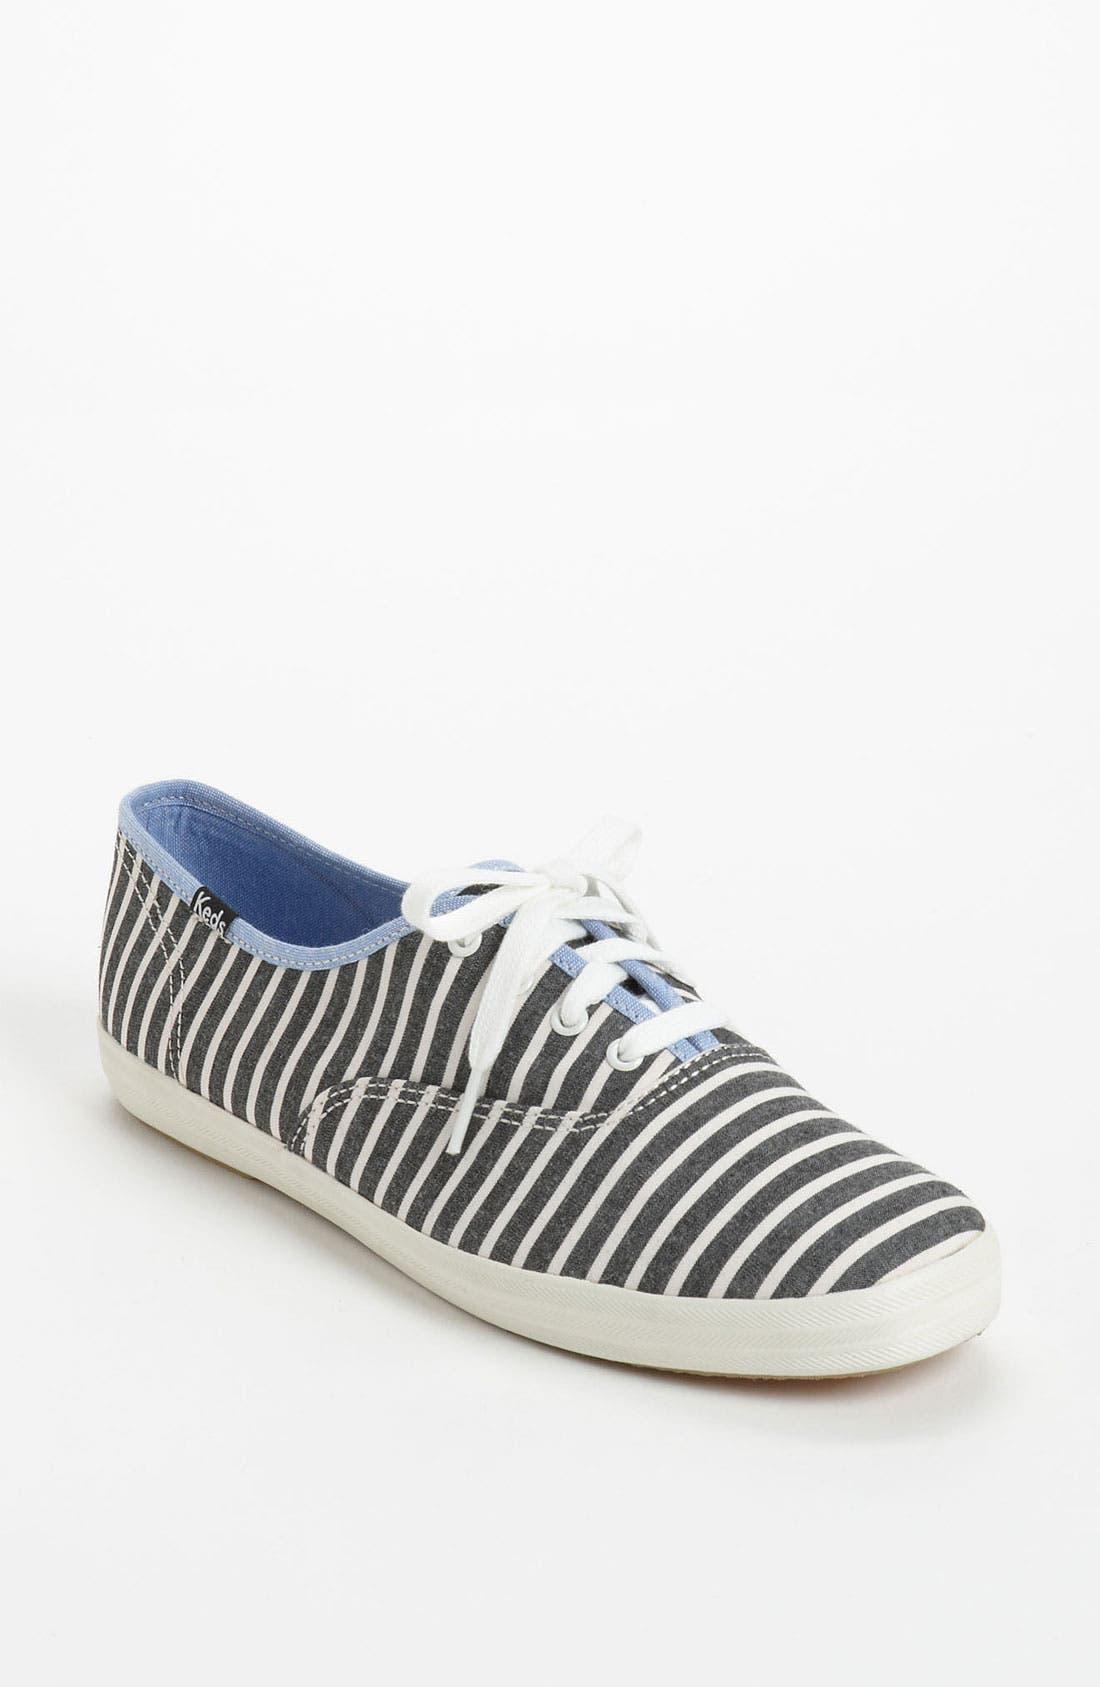 Main Image - Keds® 'Champion Prep Stripe' Sneaker (Women)